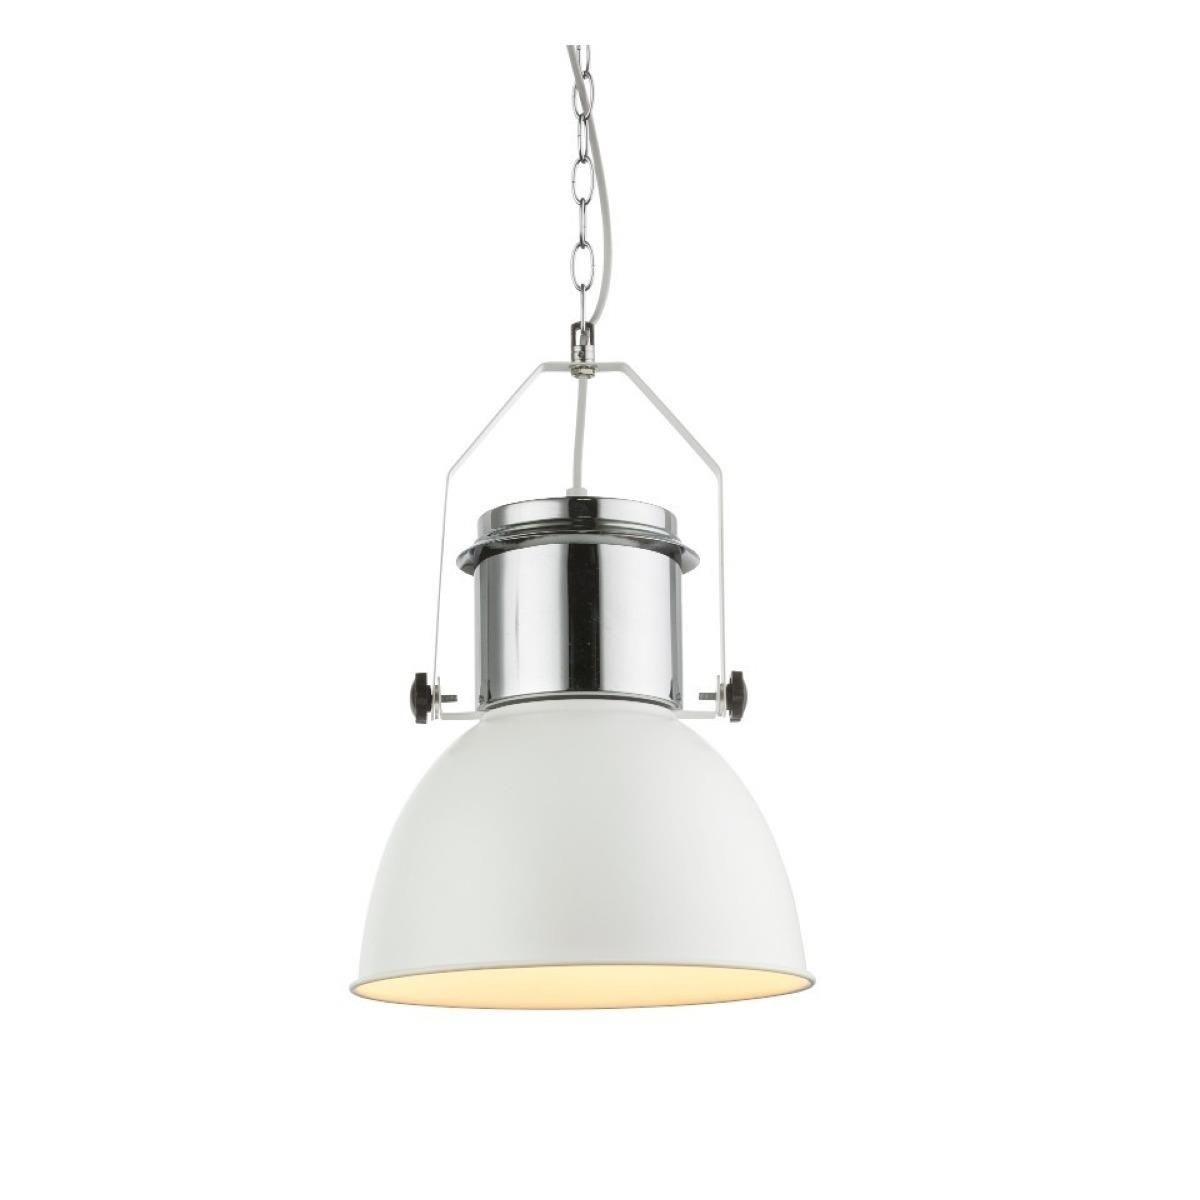 Lampa Wisząca E27 Metal Retro Loft Salon Kuchnia